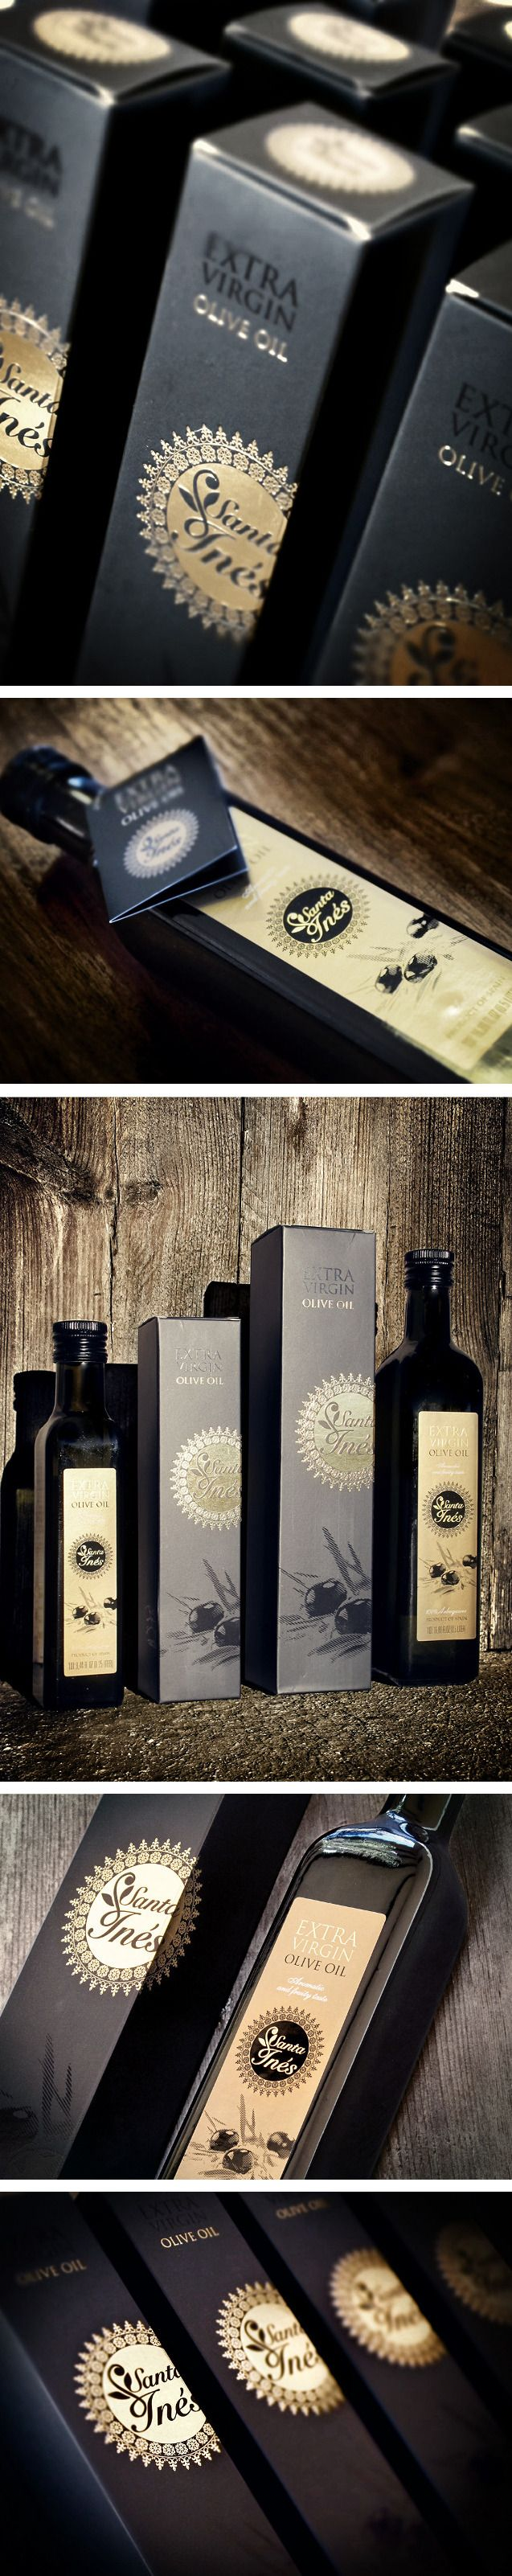 Santa Inés Olive Oil by estudioversus https://www.etsy.com/listing/154163747/olive-oil-bottle